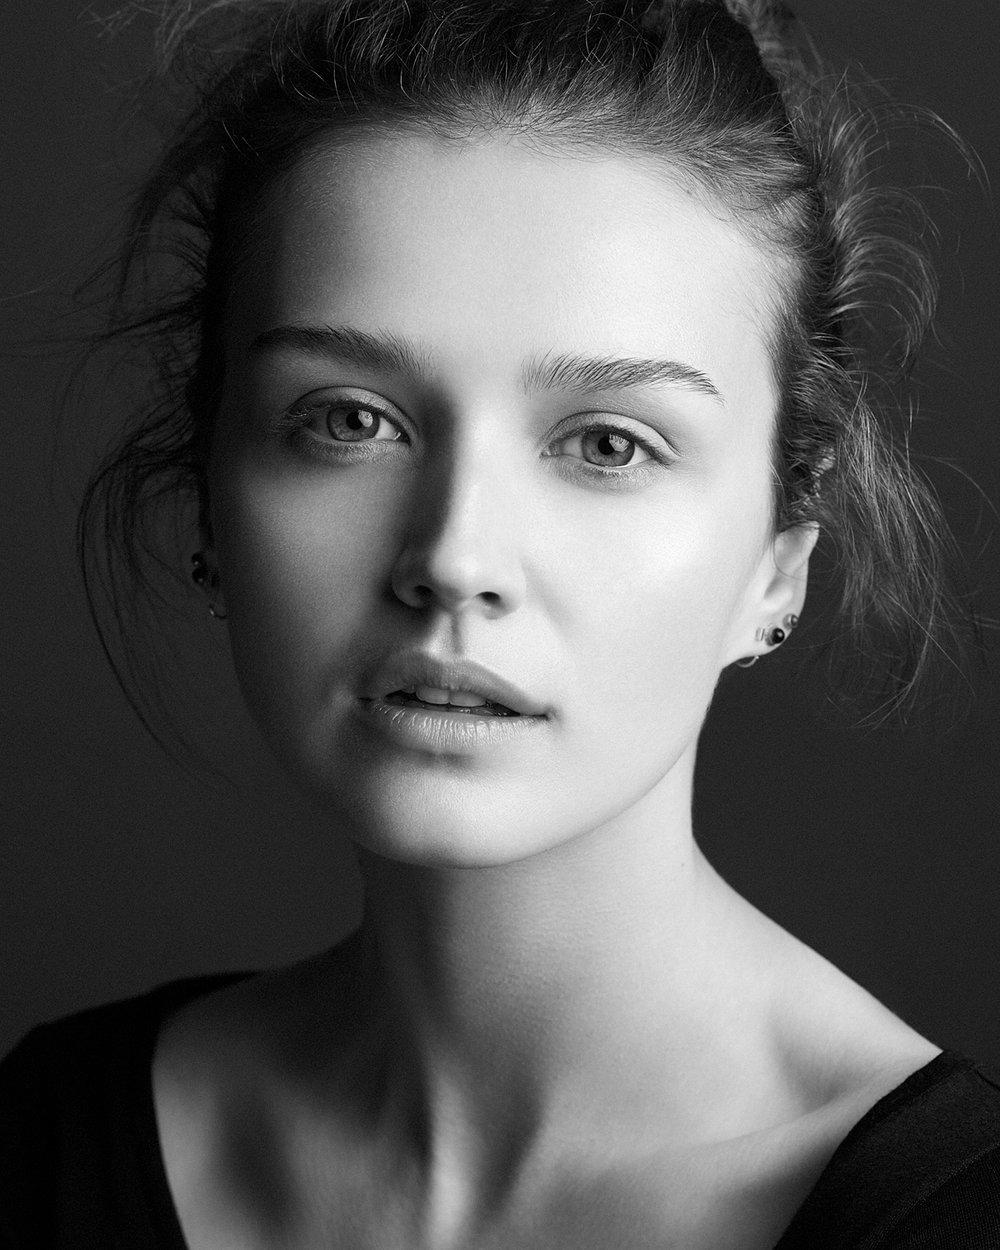 Jamiya-Wilson-Portraits-AlleJohnson.jpg